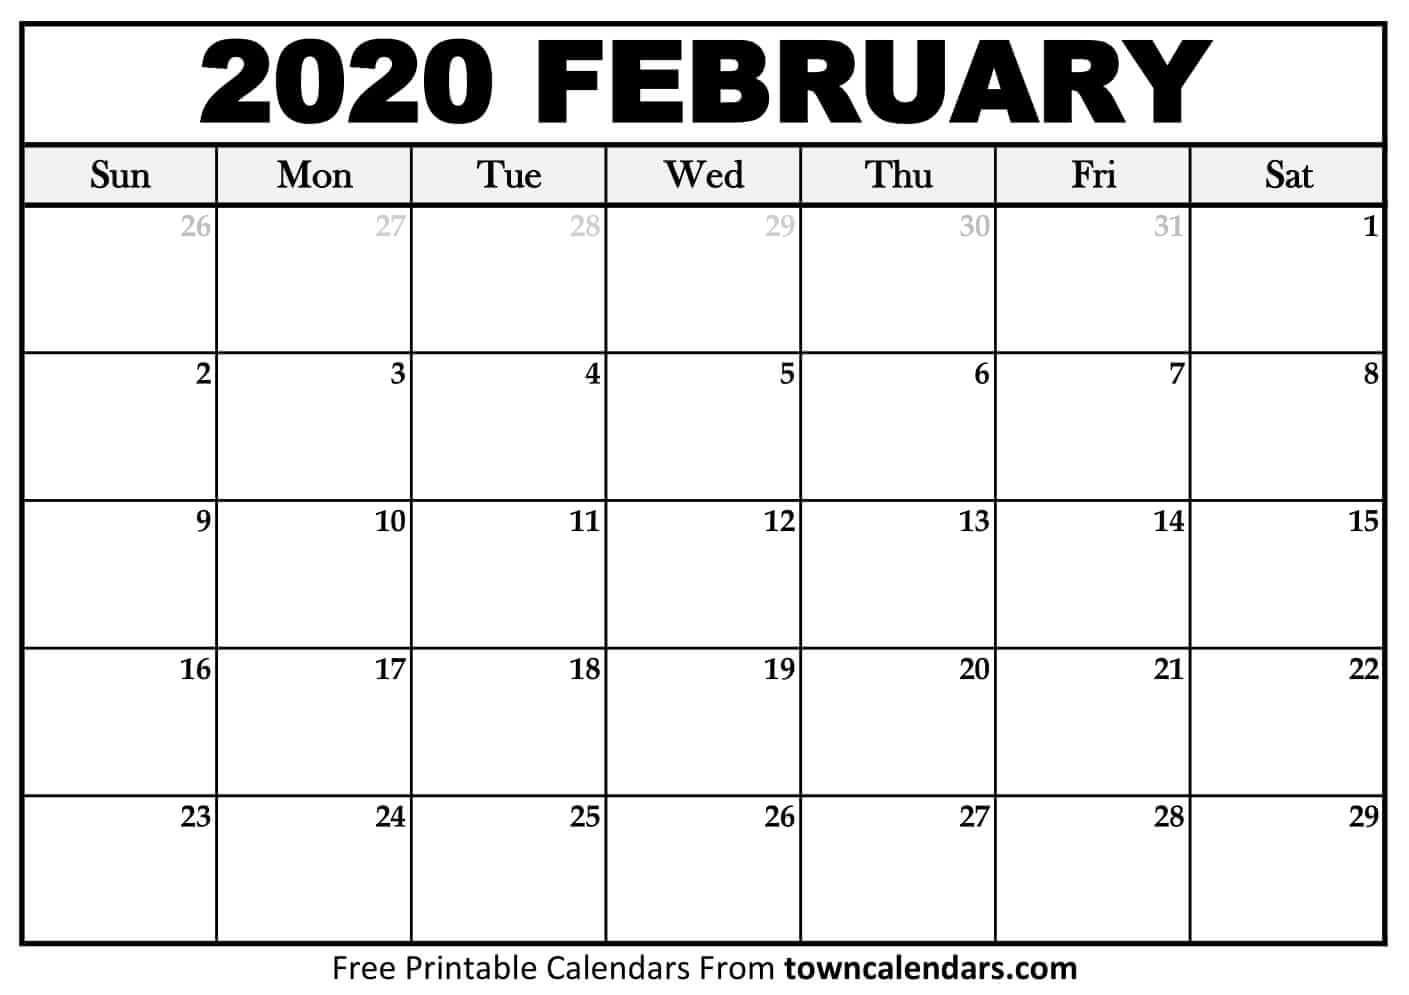 Printable February 2020 Calendar - Towncalendars  Printable February 2020 Calendar Page